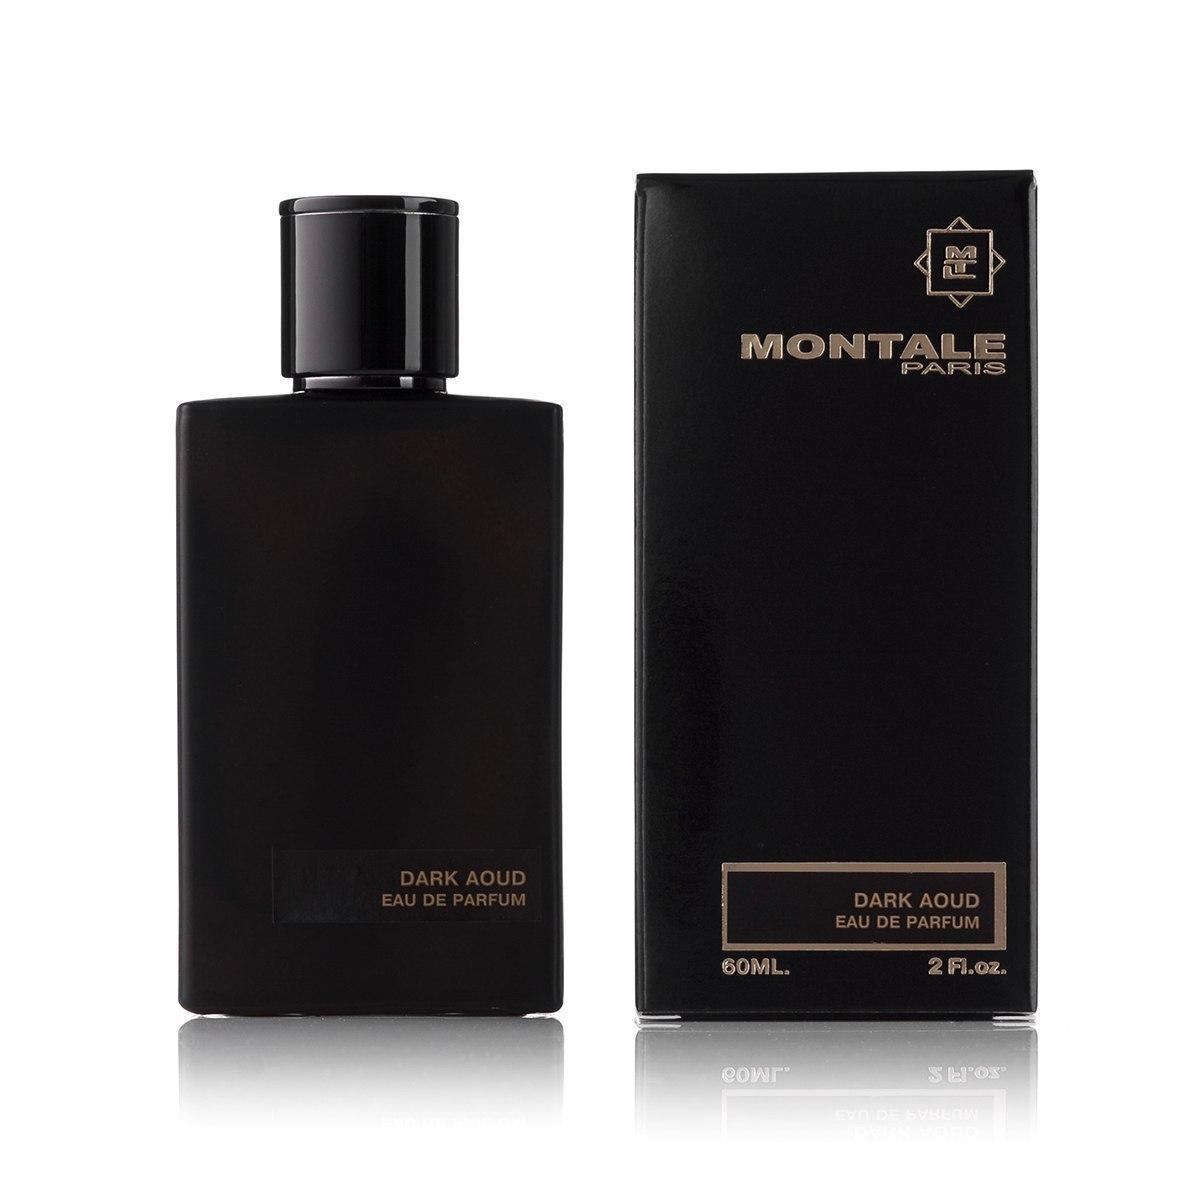 60 ml Міні-парфуми Montale Dark Aoud (унісекс) - M-12